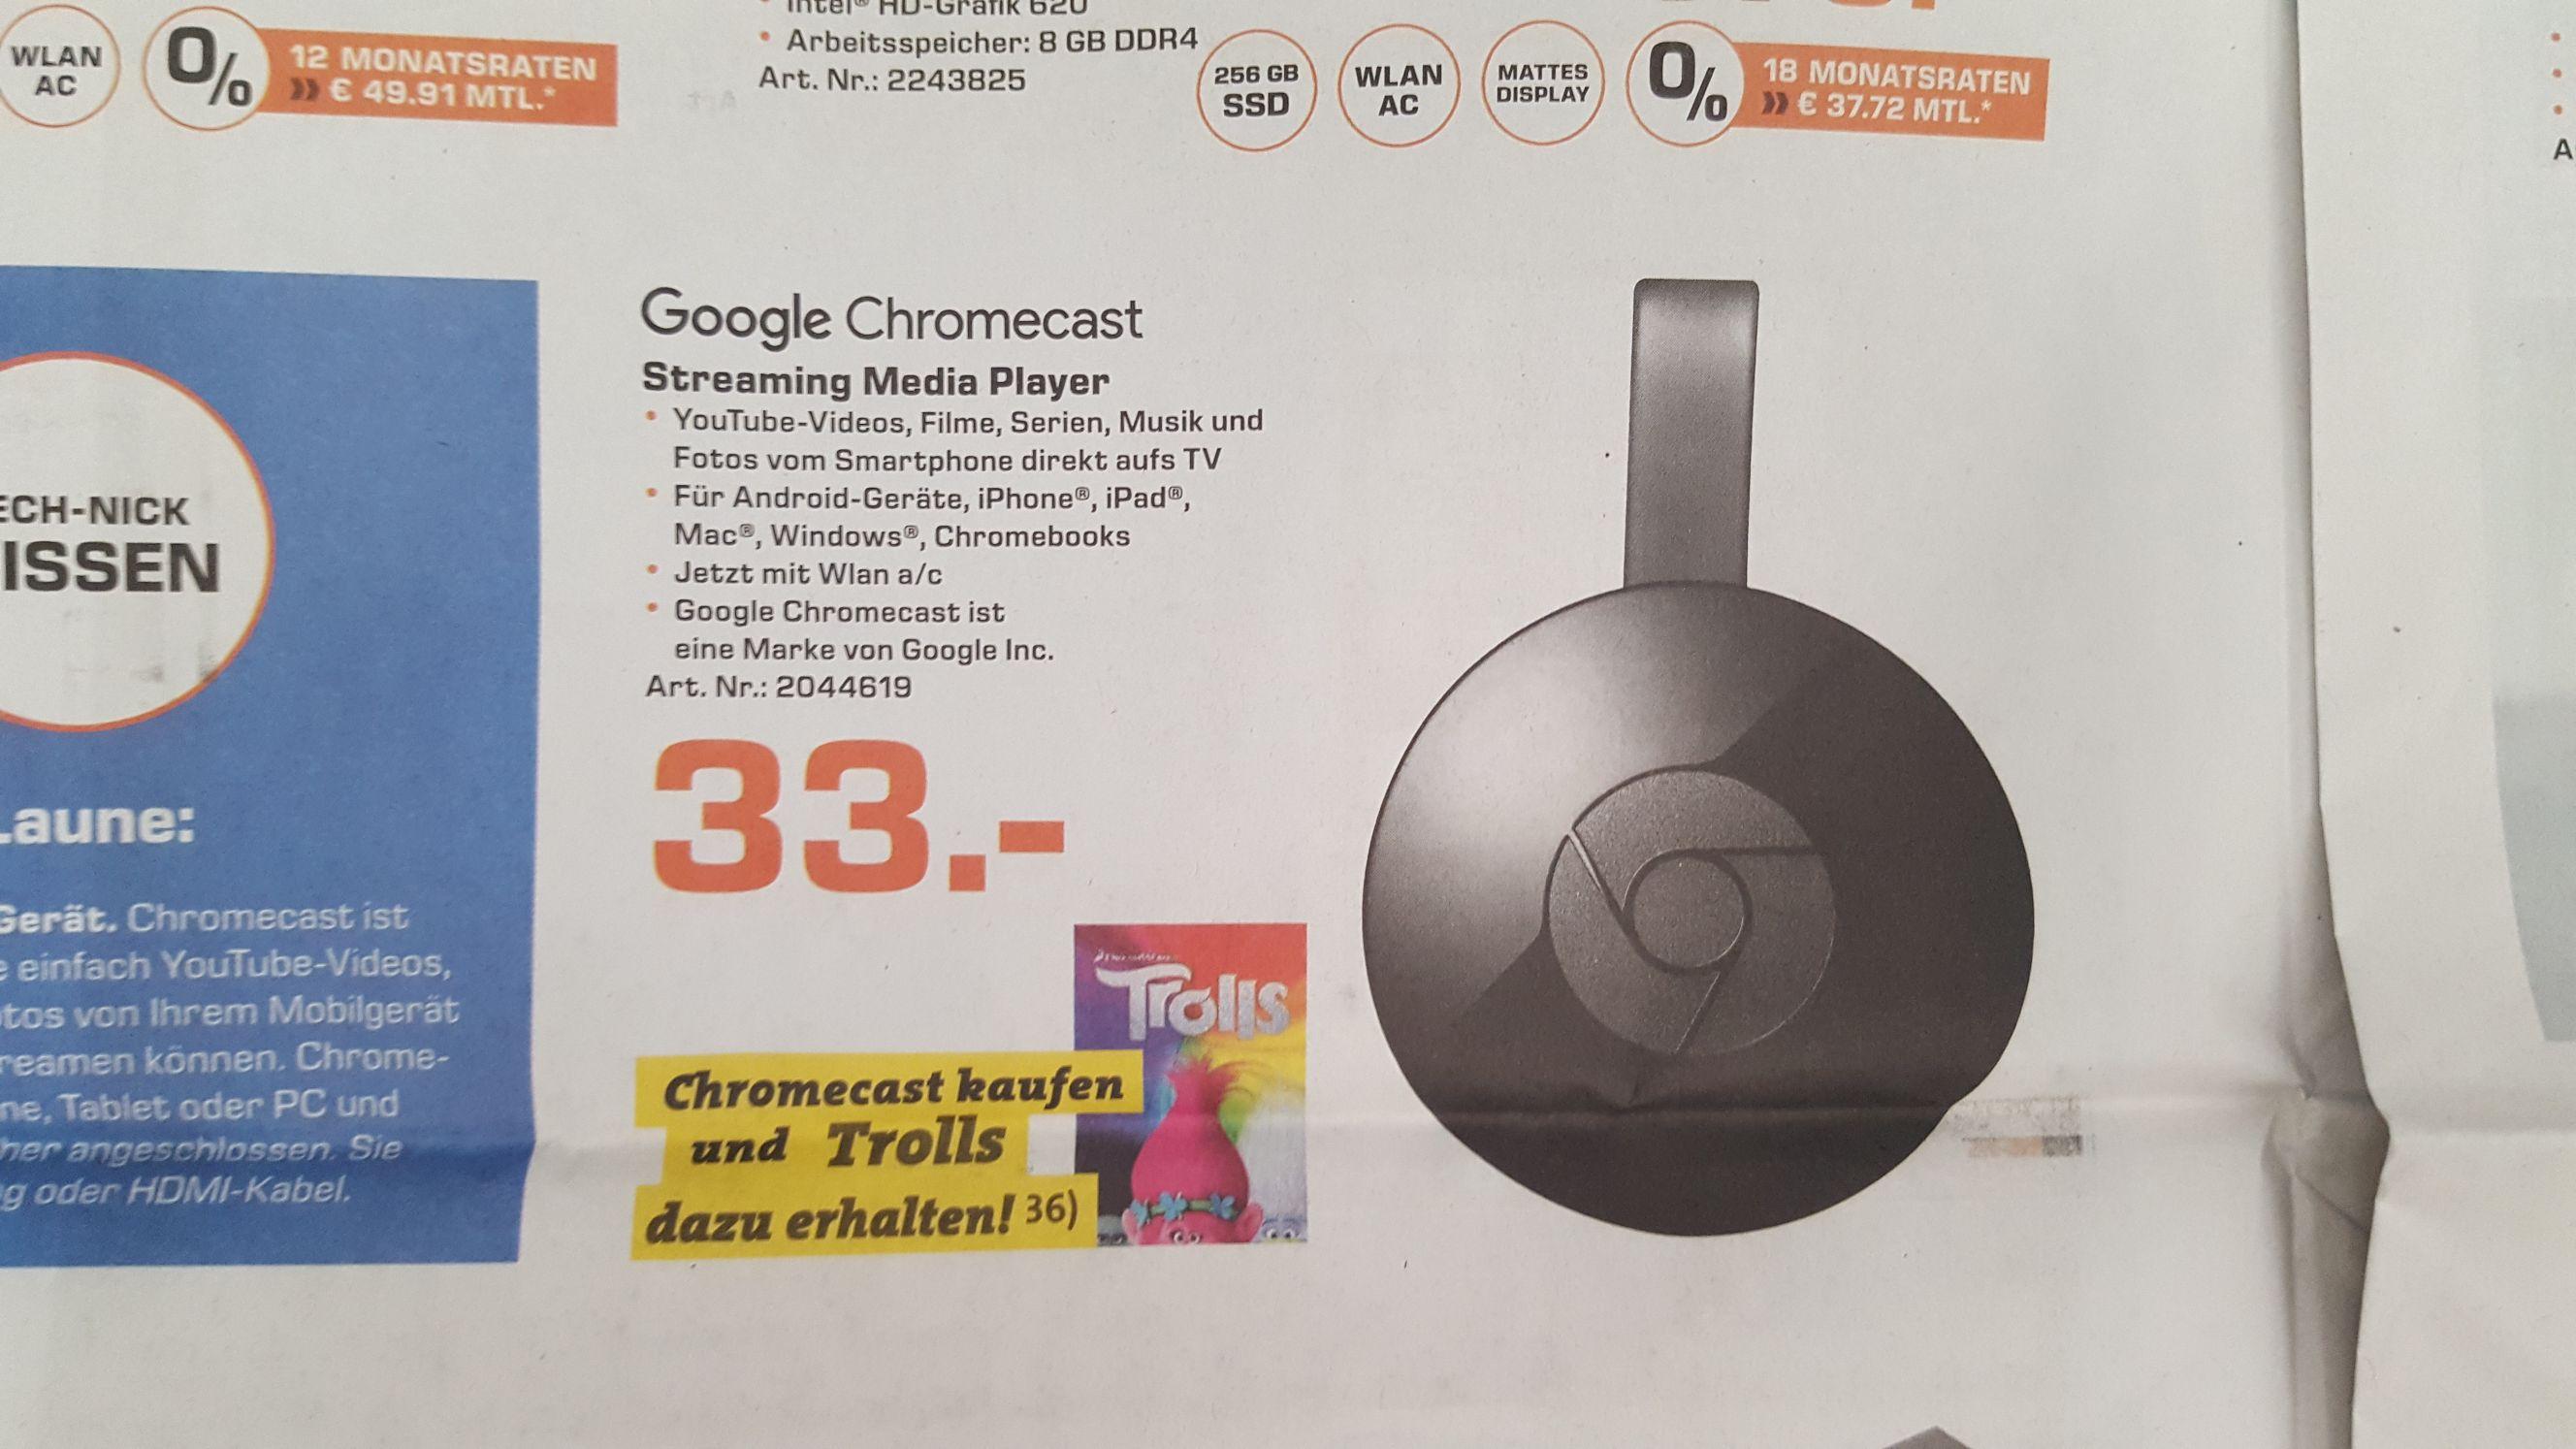 Saturn Google Chromecast inklusive Trolls